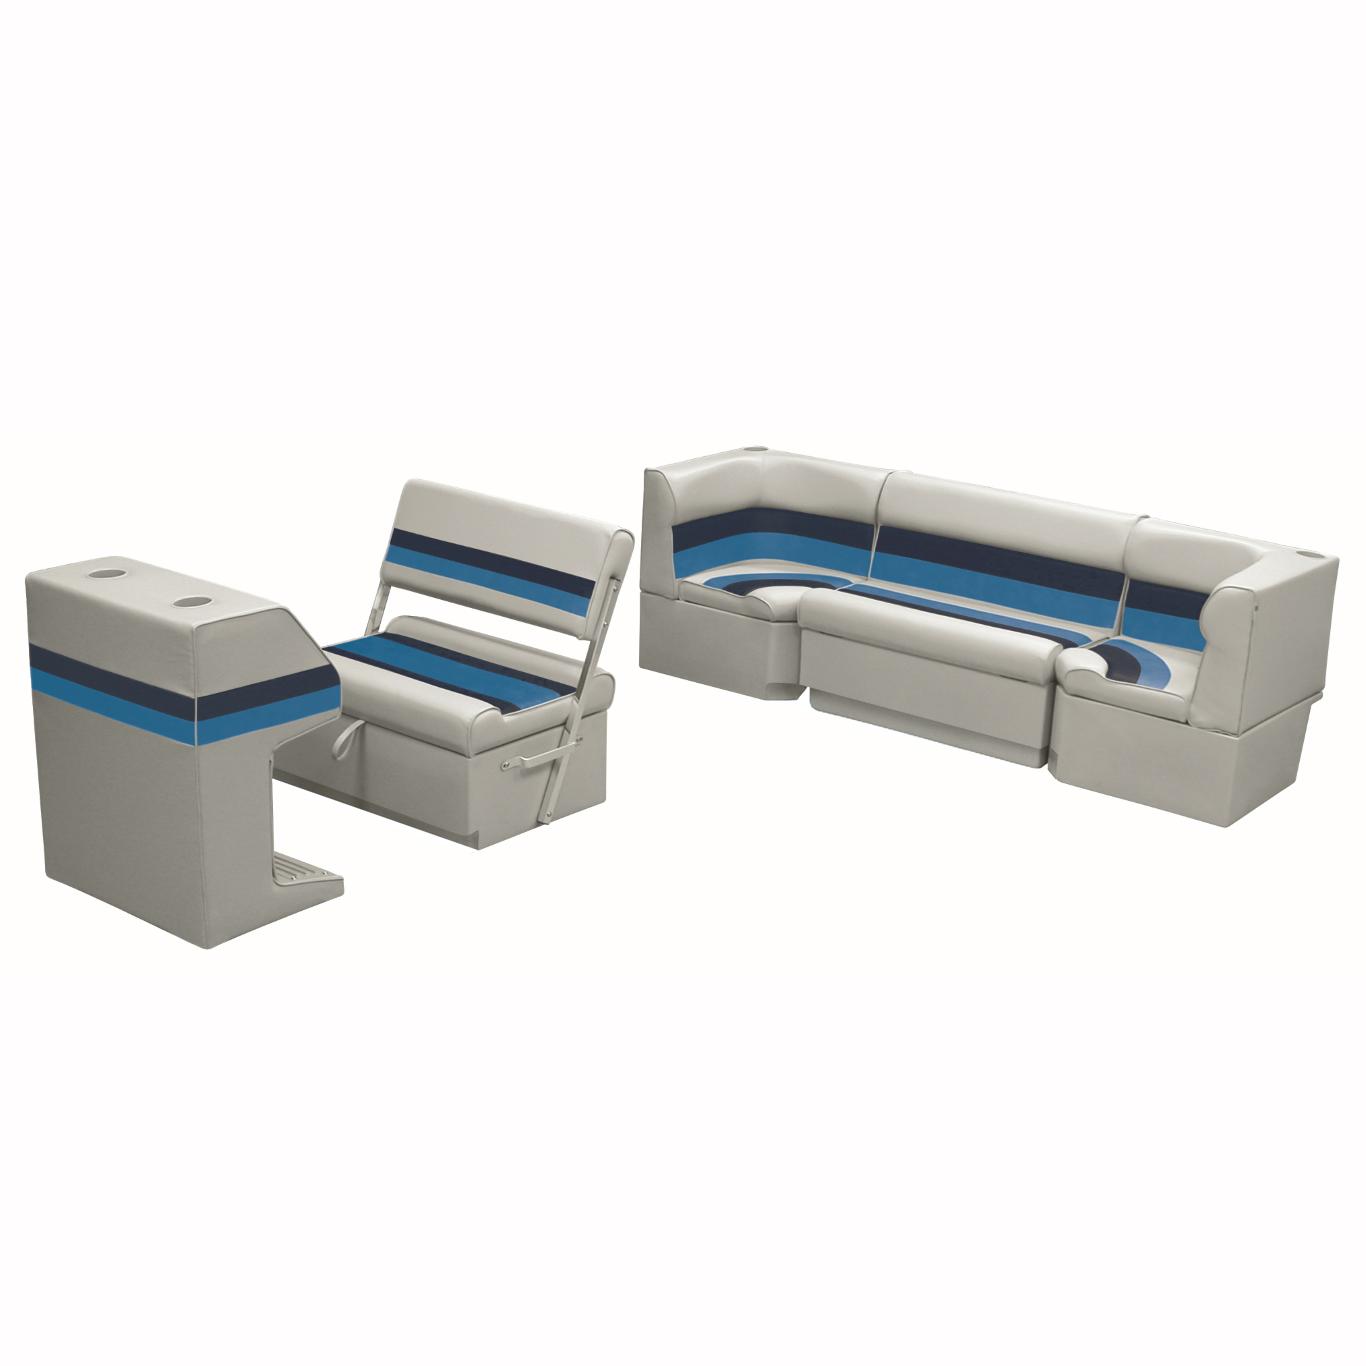 Deluxe Pontoon Furniture w/Toe Kick Base - Rear Cozy Package, Gray/Navy/Blue